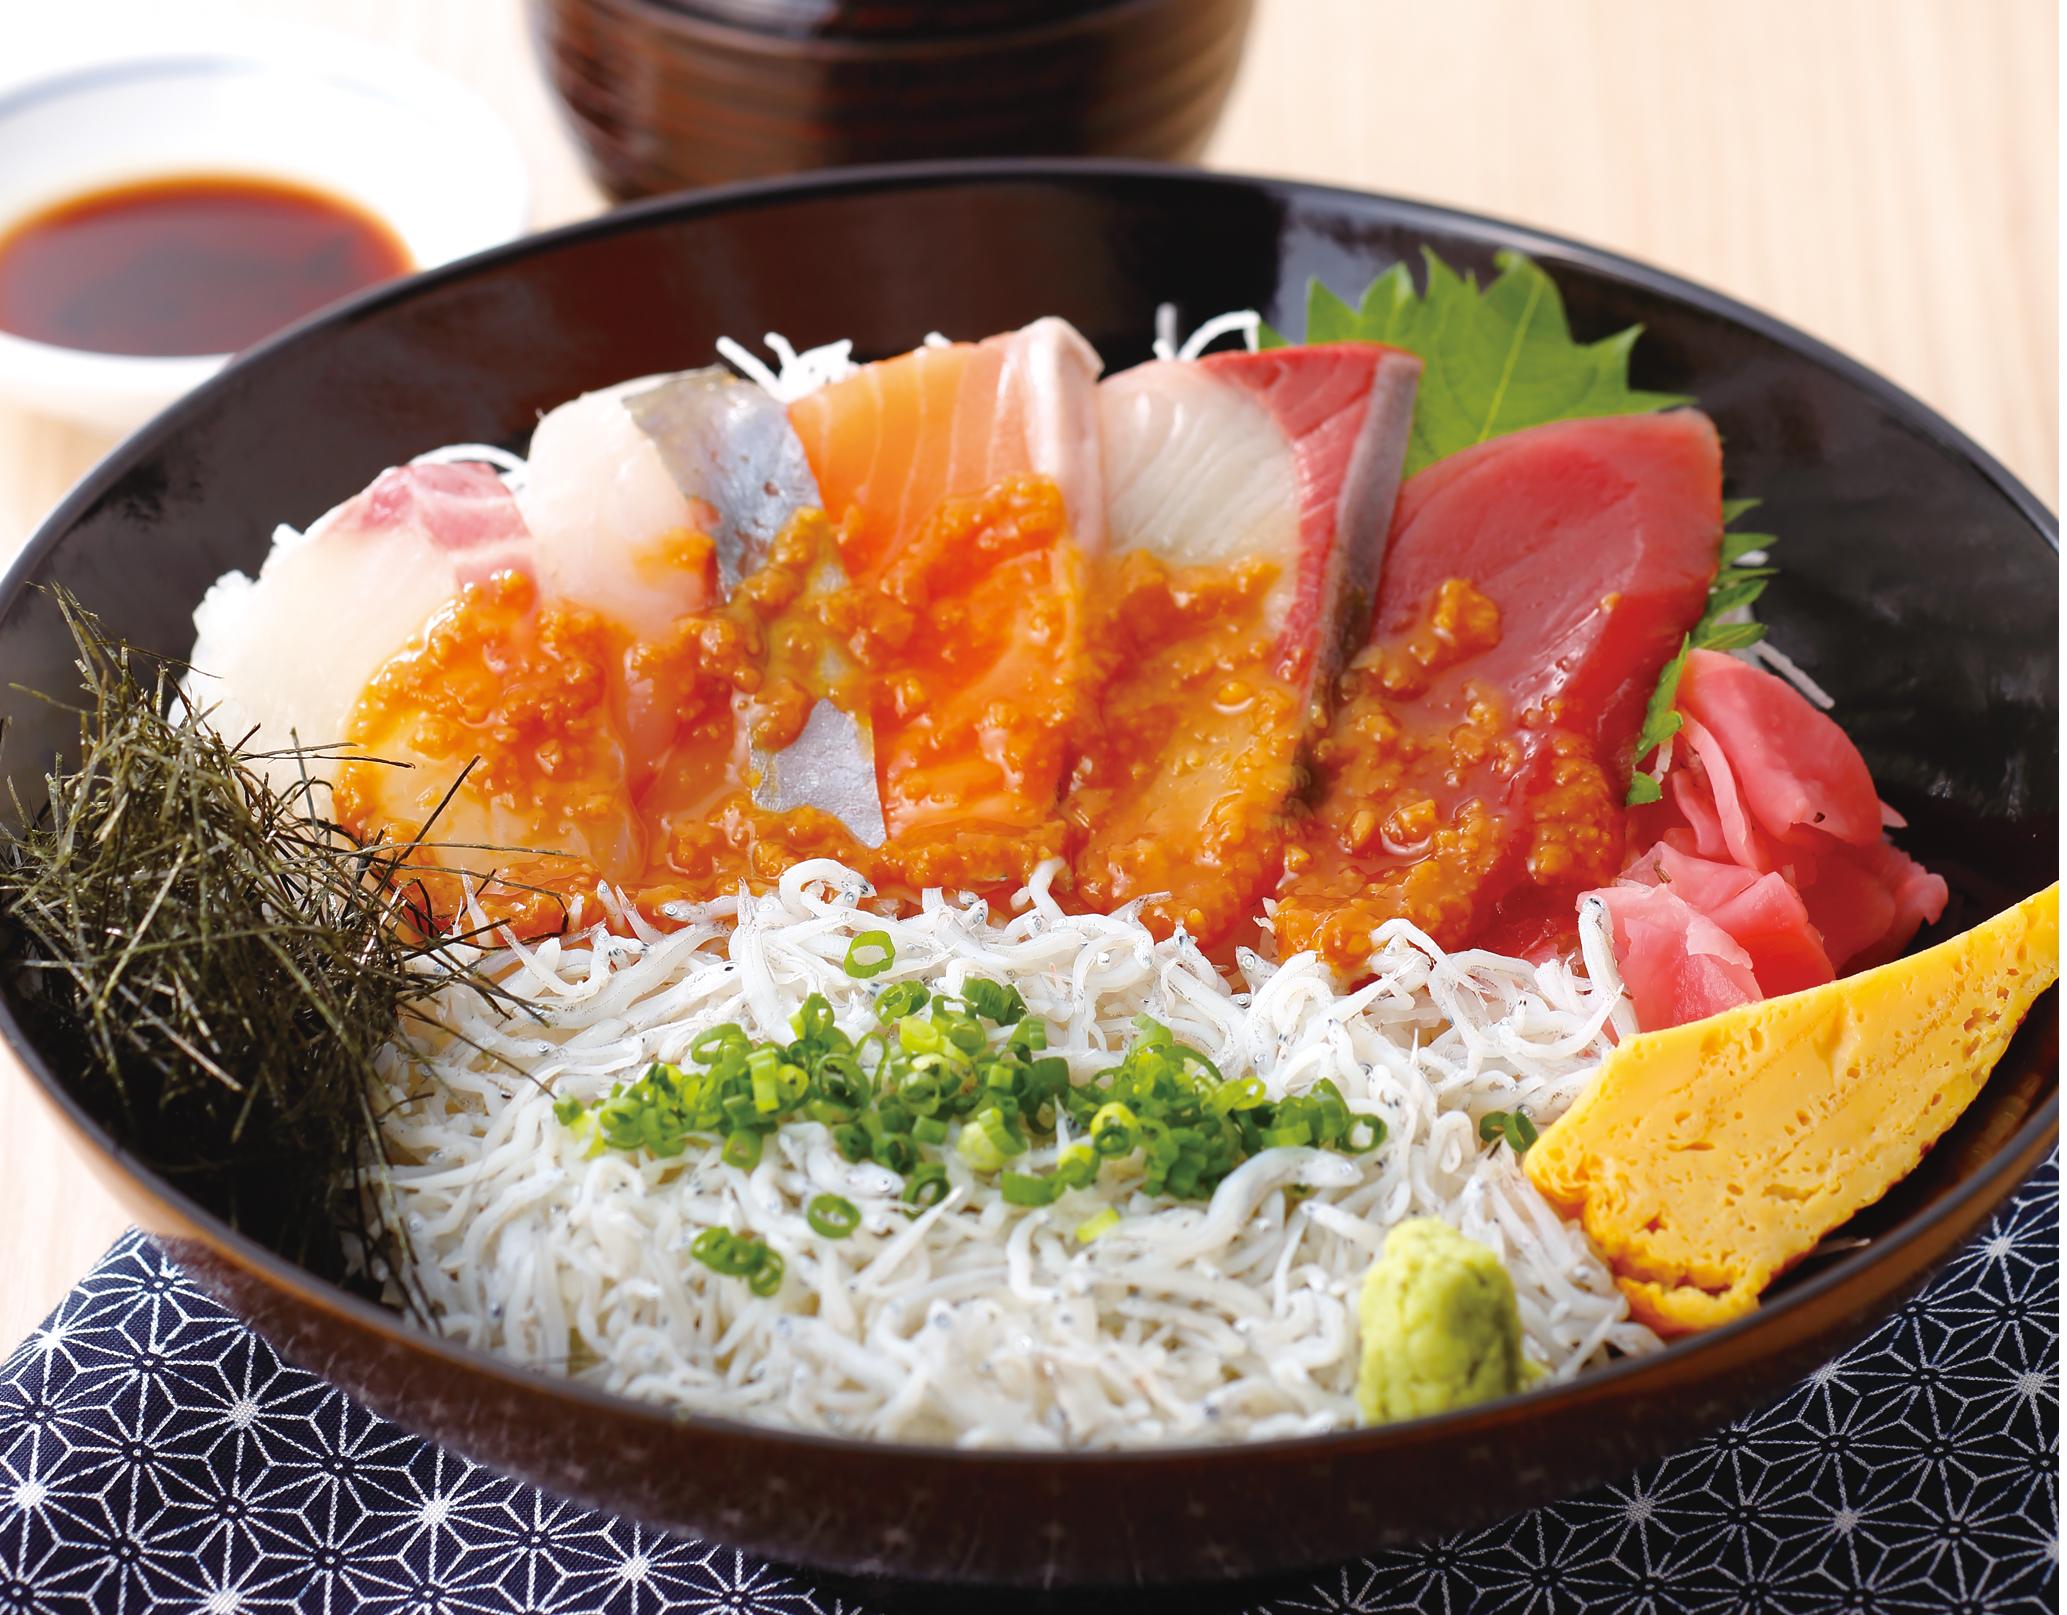 海鮮醤油糀漬け丼